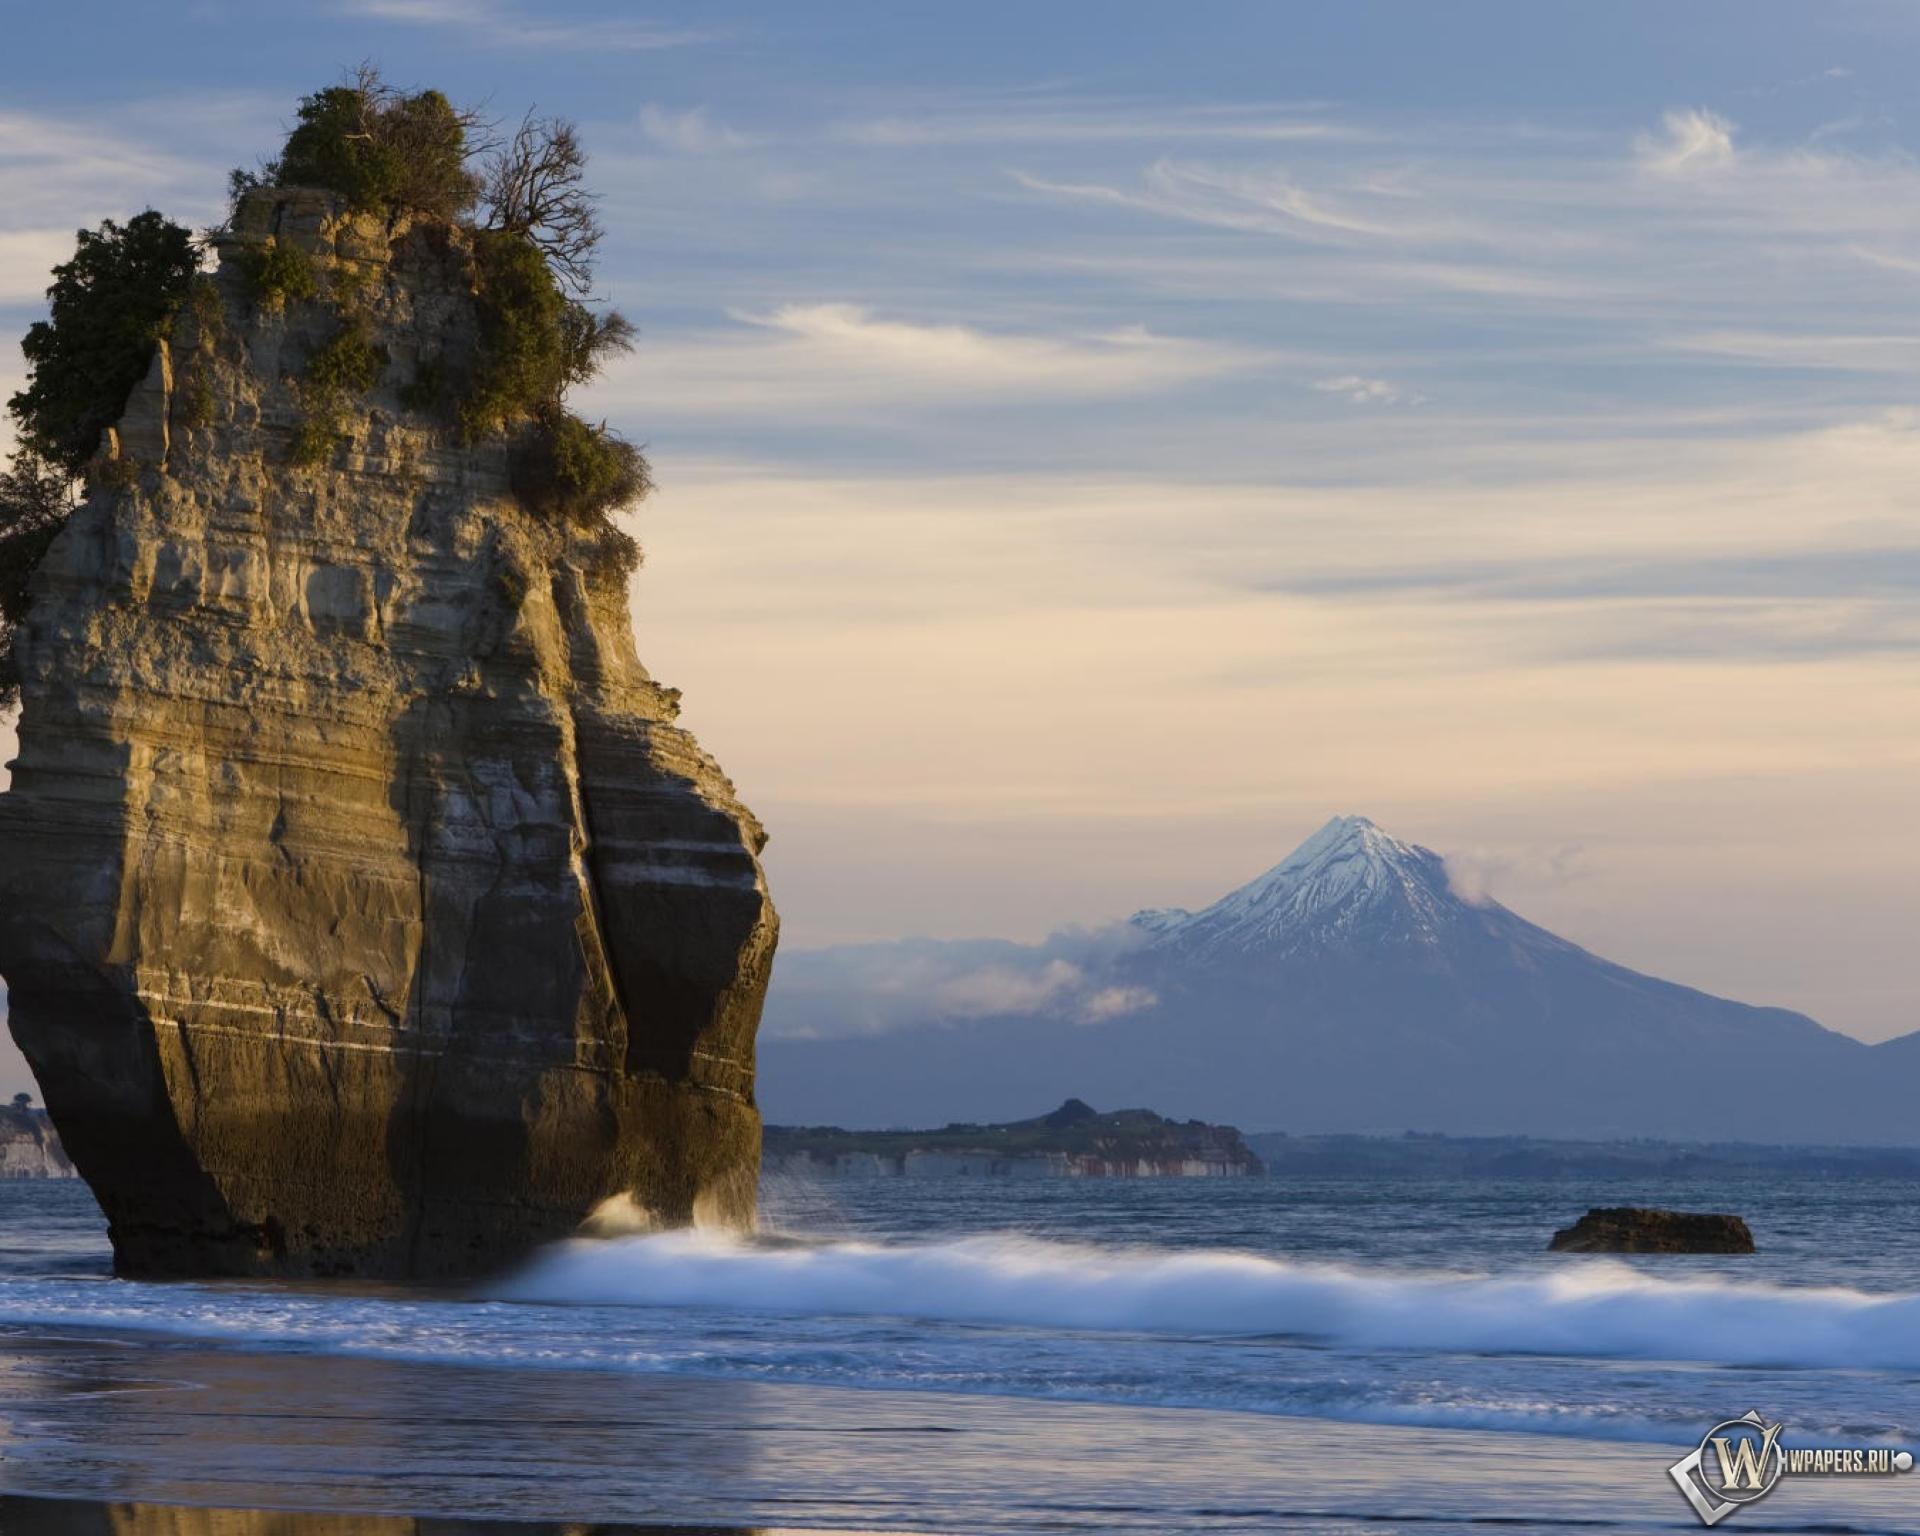 природа море горы скалы дома nature sea mountains rock home  № 425140 бесплатно